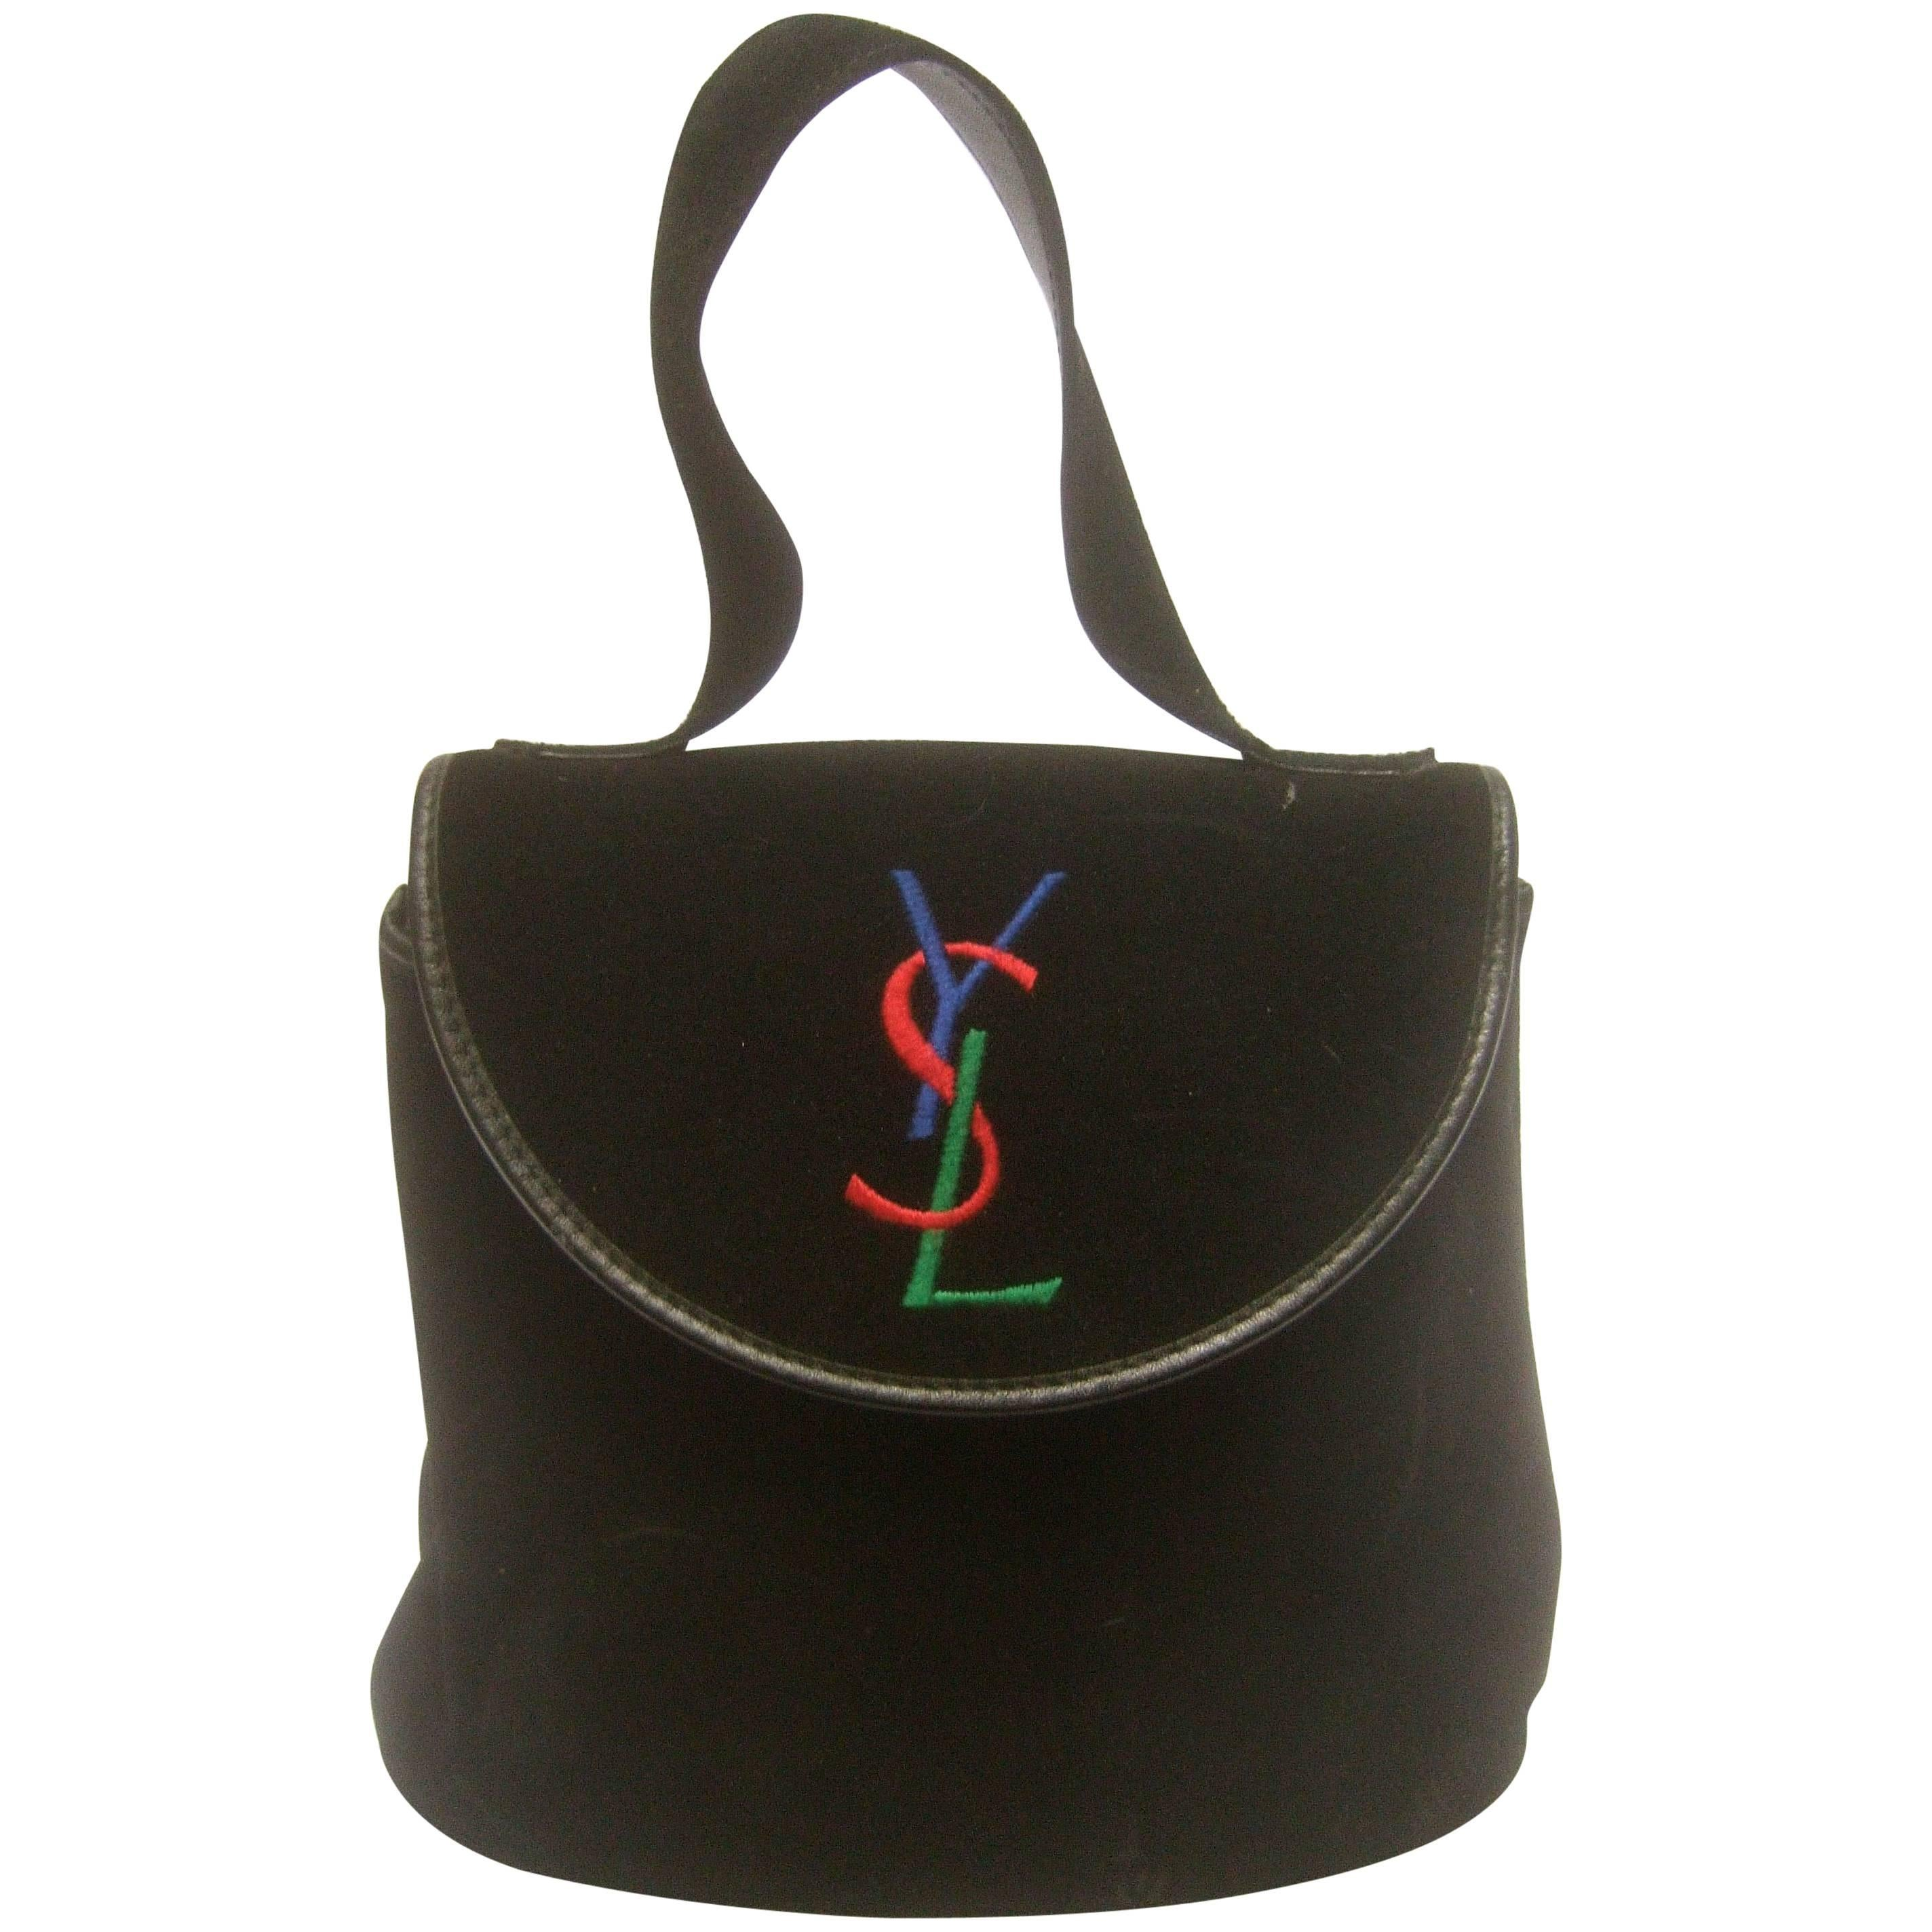 9c68a2ab132 Yves Saint Laurent YSL Vintage Black Leather Arabesque Handbag For Sale at  1stdibs